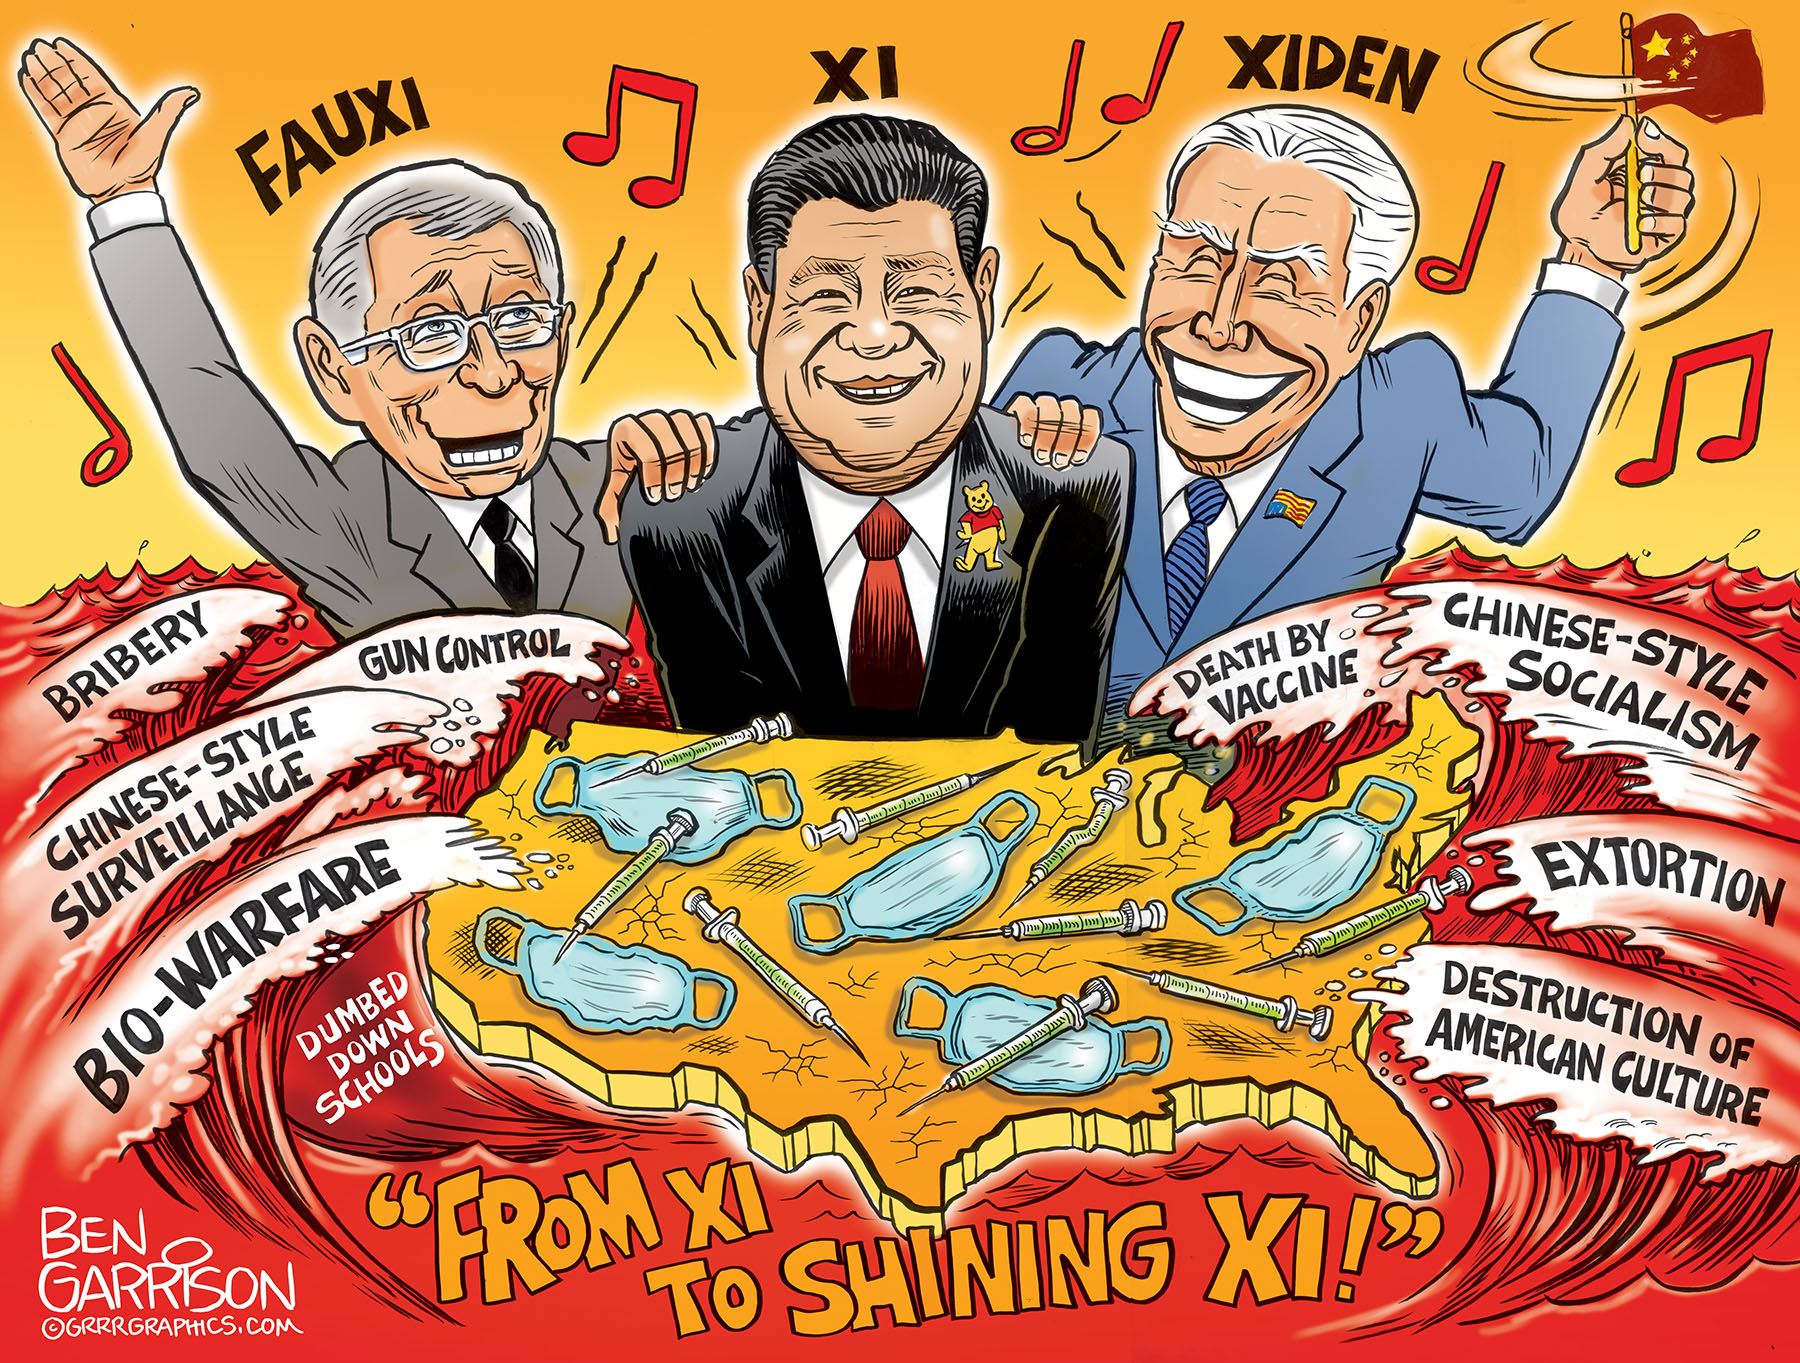 Xi to Shining Xi United States of China